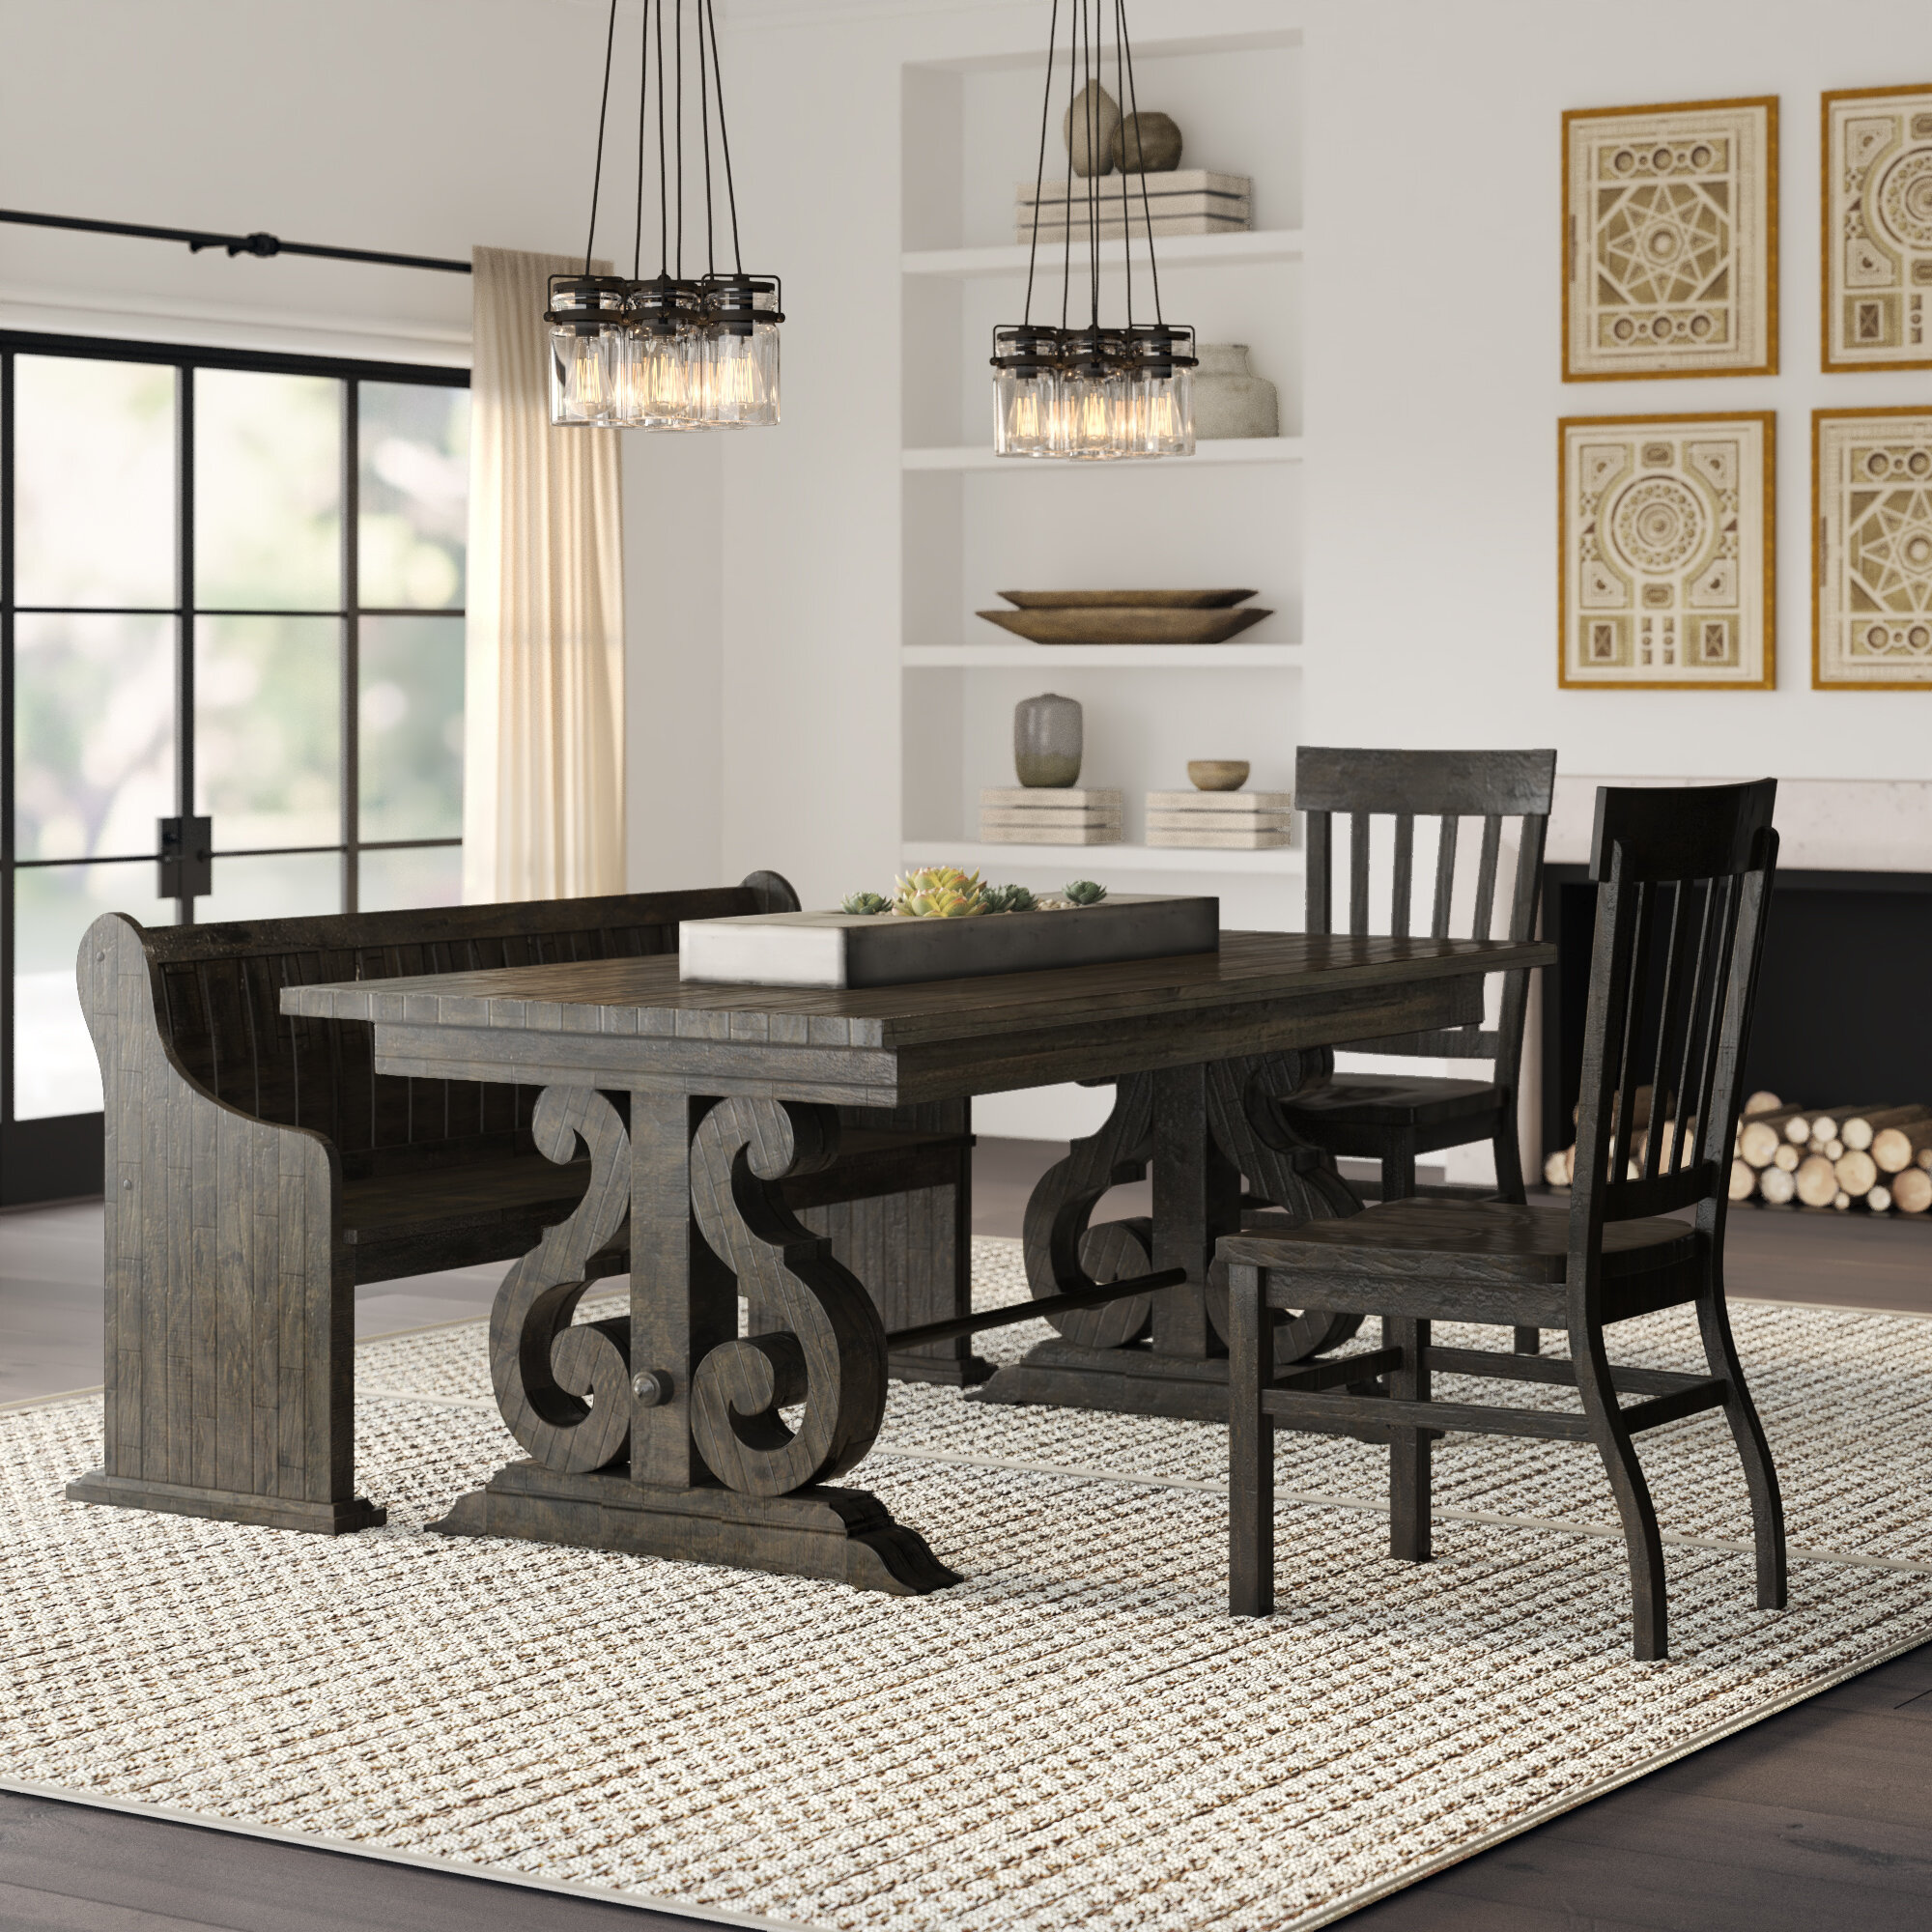 Ellenton Coffee Table With Storage: Greyleigh Ellenton 4 Piece Dining Set